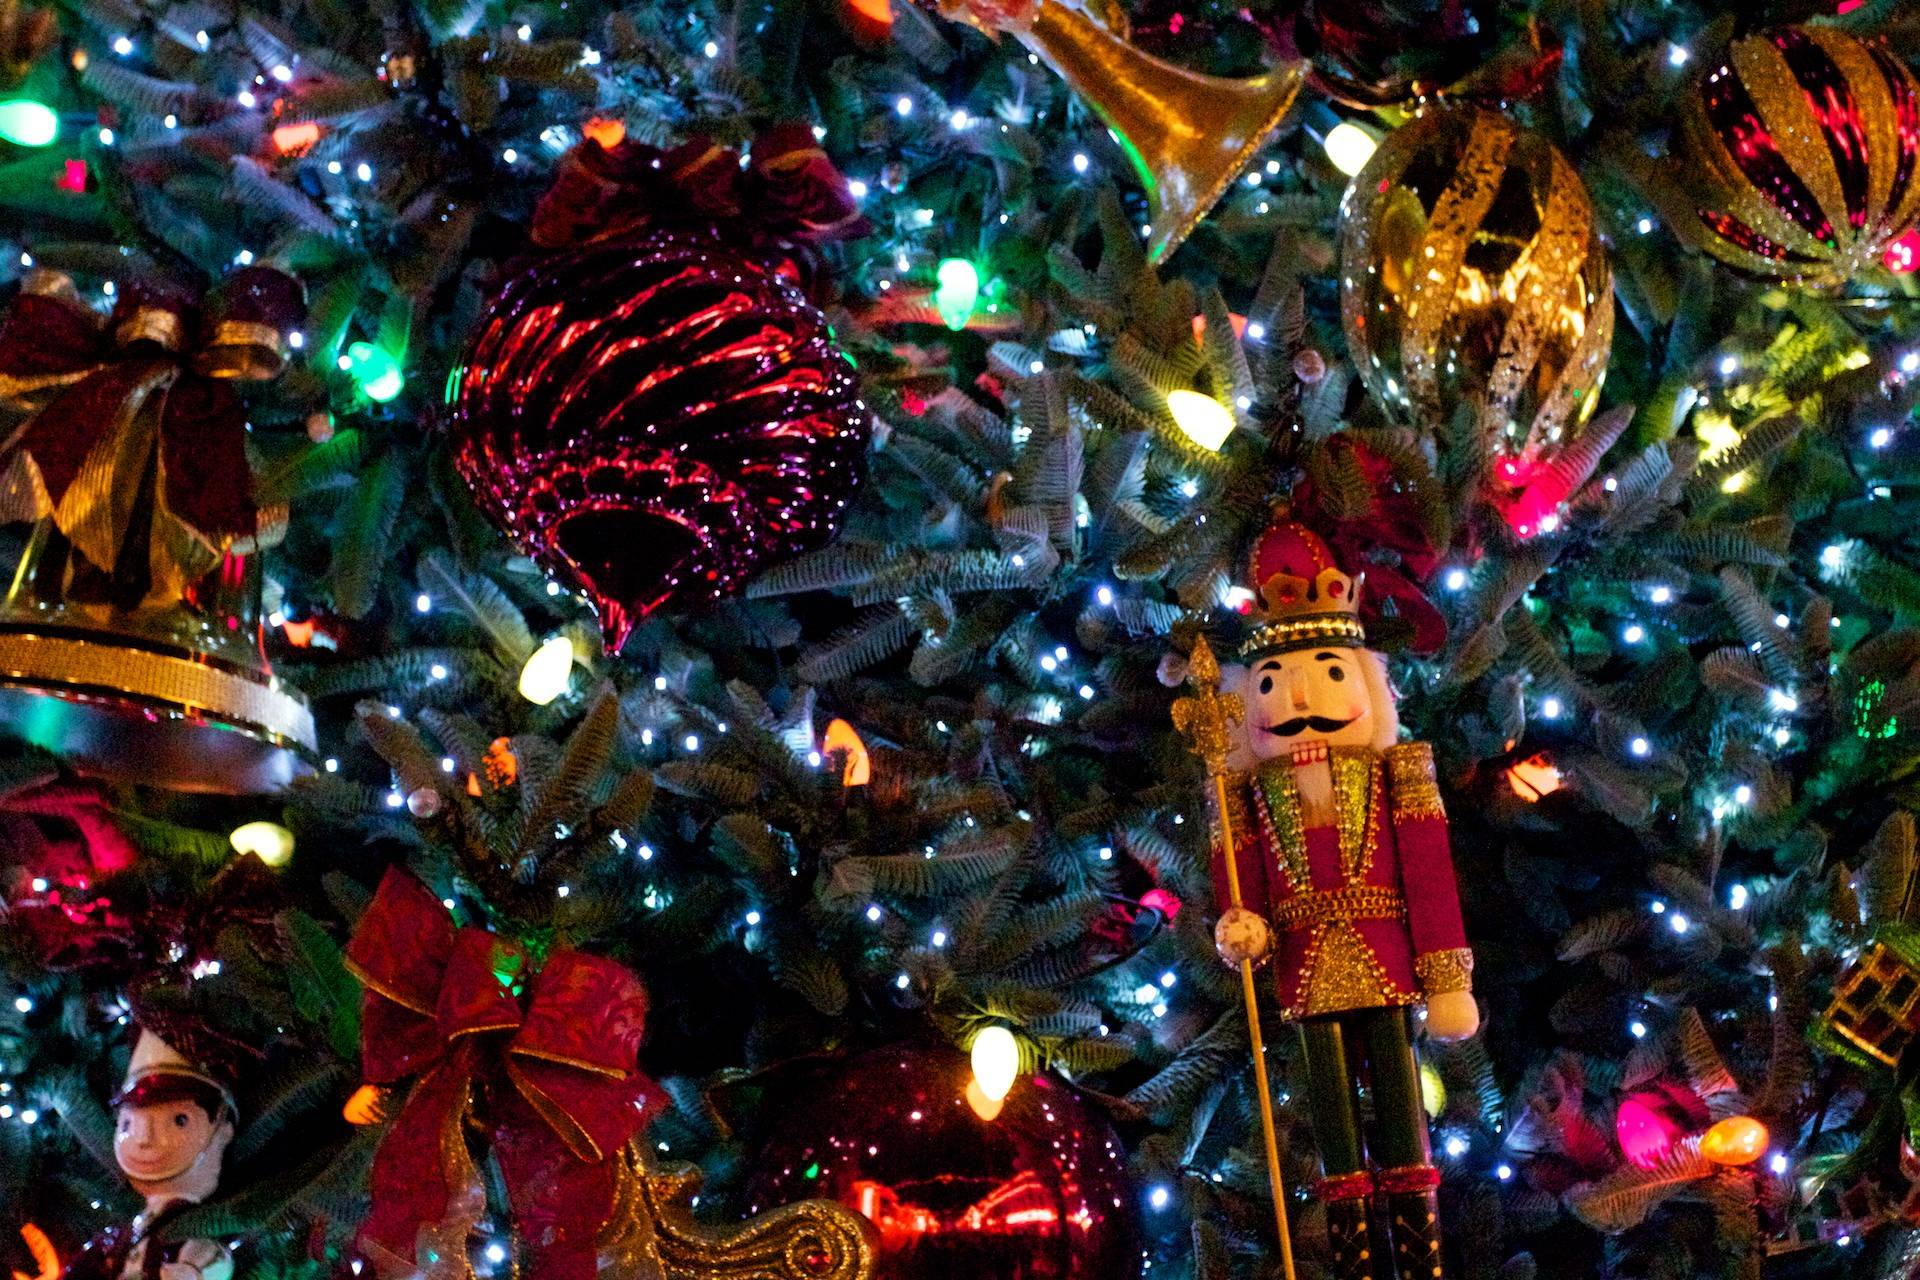 christmas tree with nutcracker desktop wallpaper 1920x1280px - Desktop Christmas Tree